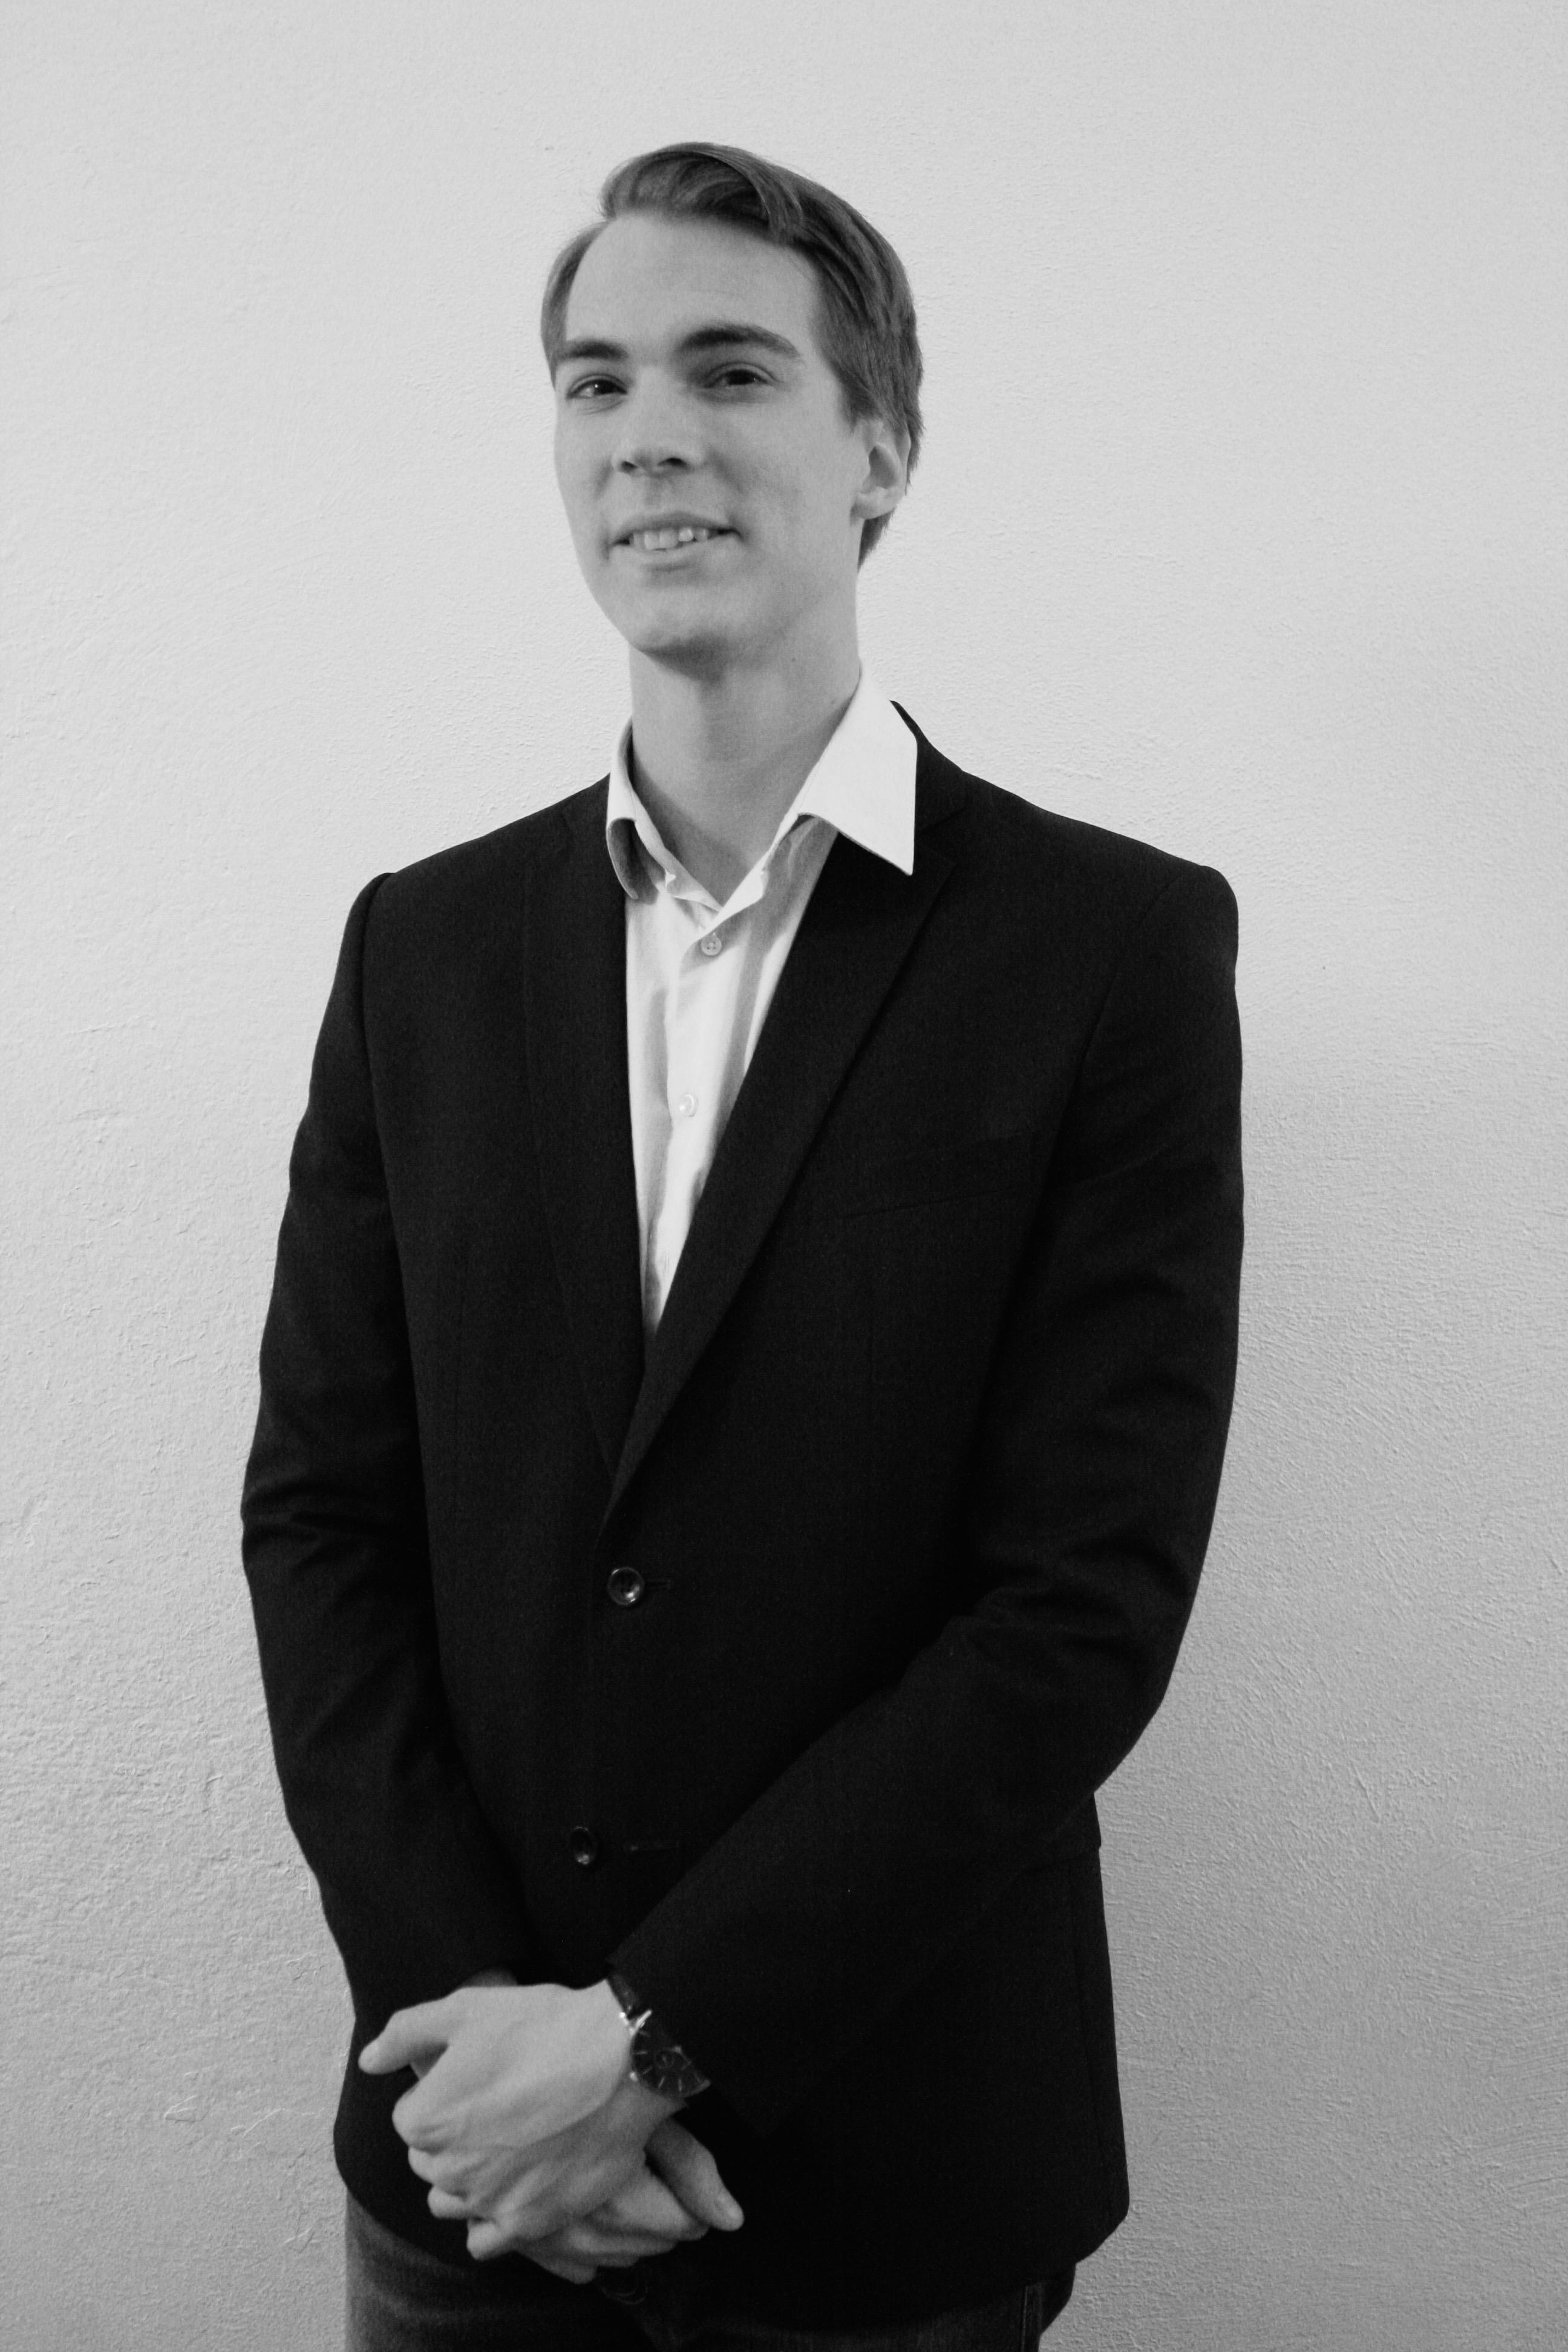 Nils Eriksson